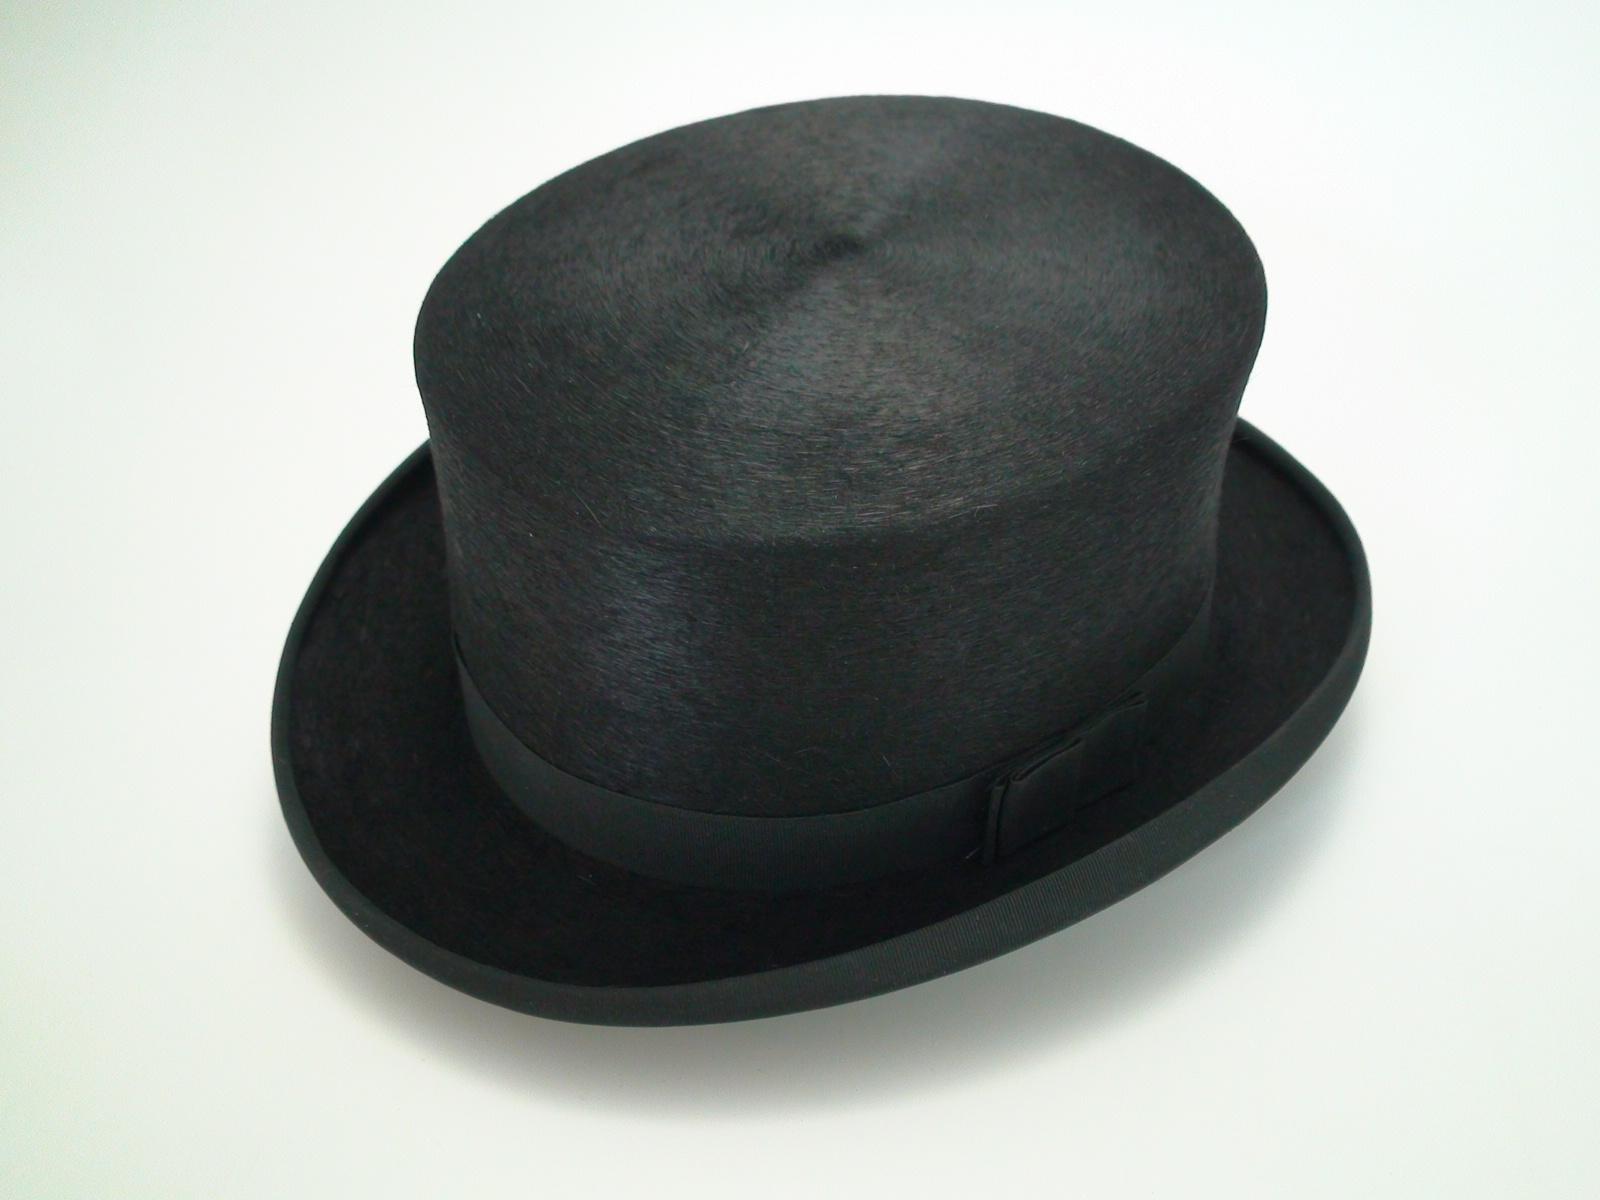 NEW Christys London Handmade 100% Fine Fur Felt Black Dressage Top Hat Size  7 3 8″ d7f8fba7e42